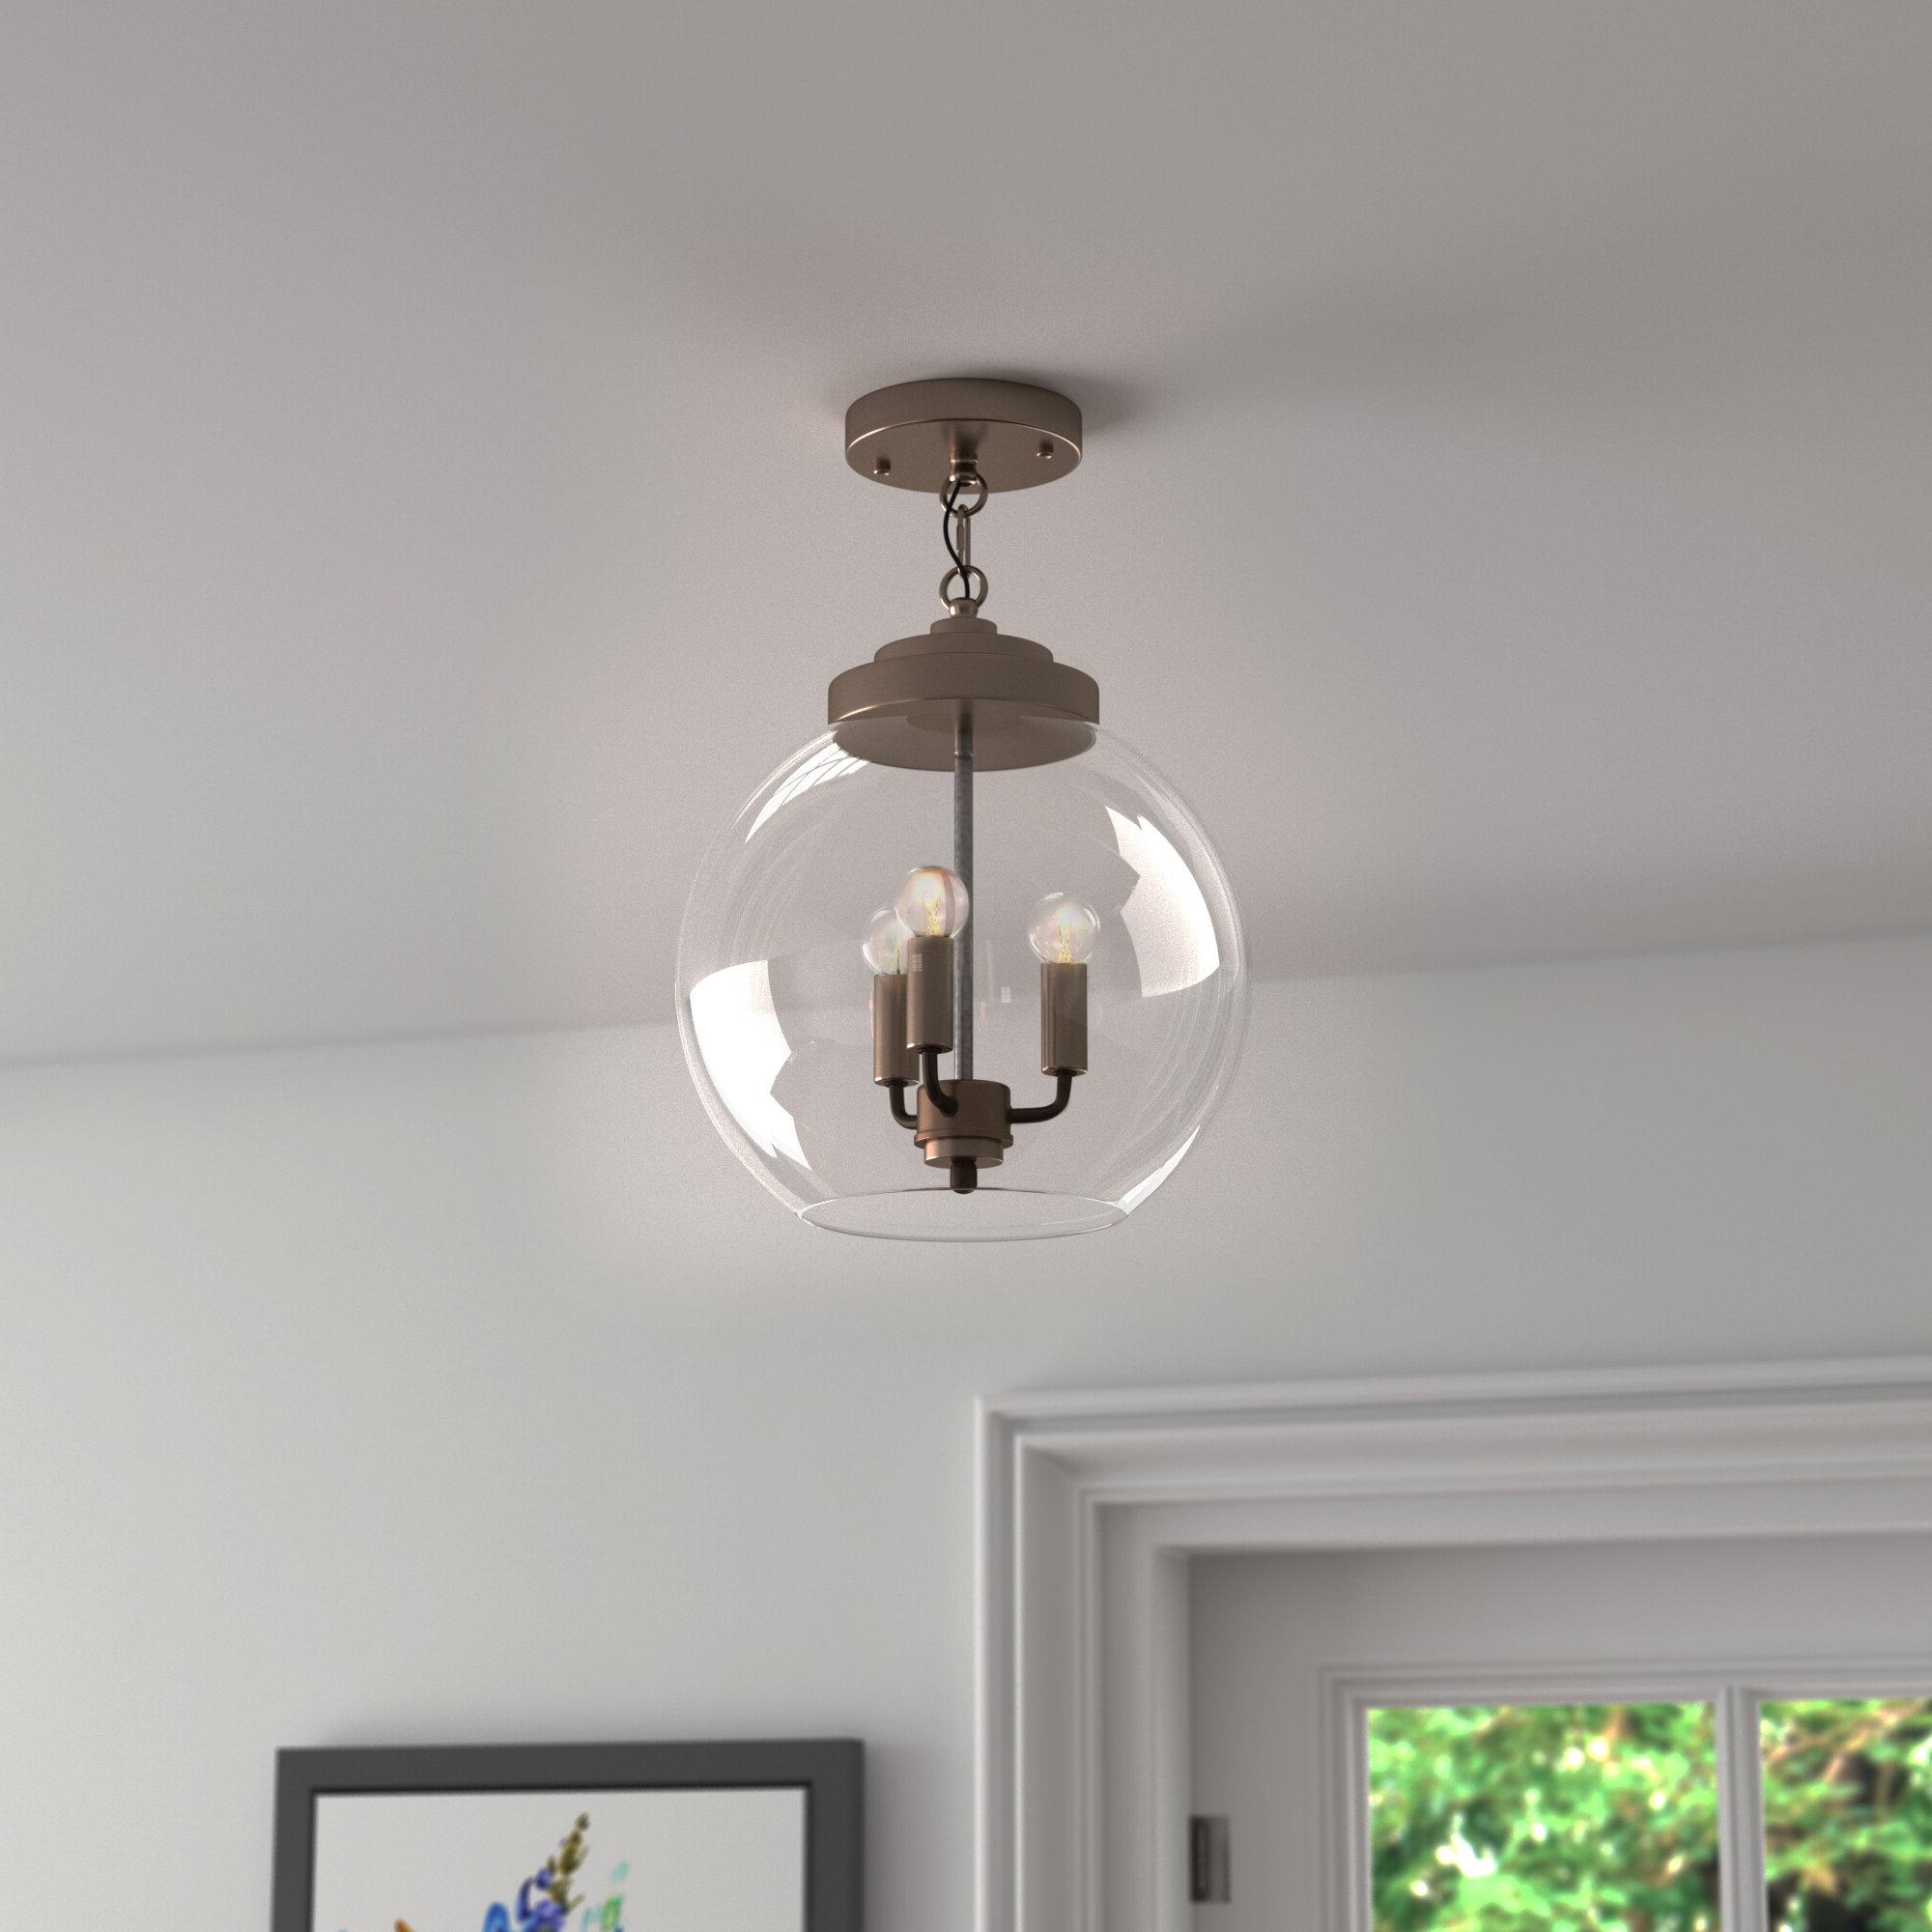 Isoline 2 Light Lantern Geometric Pendants For Latest Everly Quinn Isoline 2 Light Lantern Geometric Pendant (View 5 of 20)